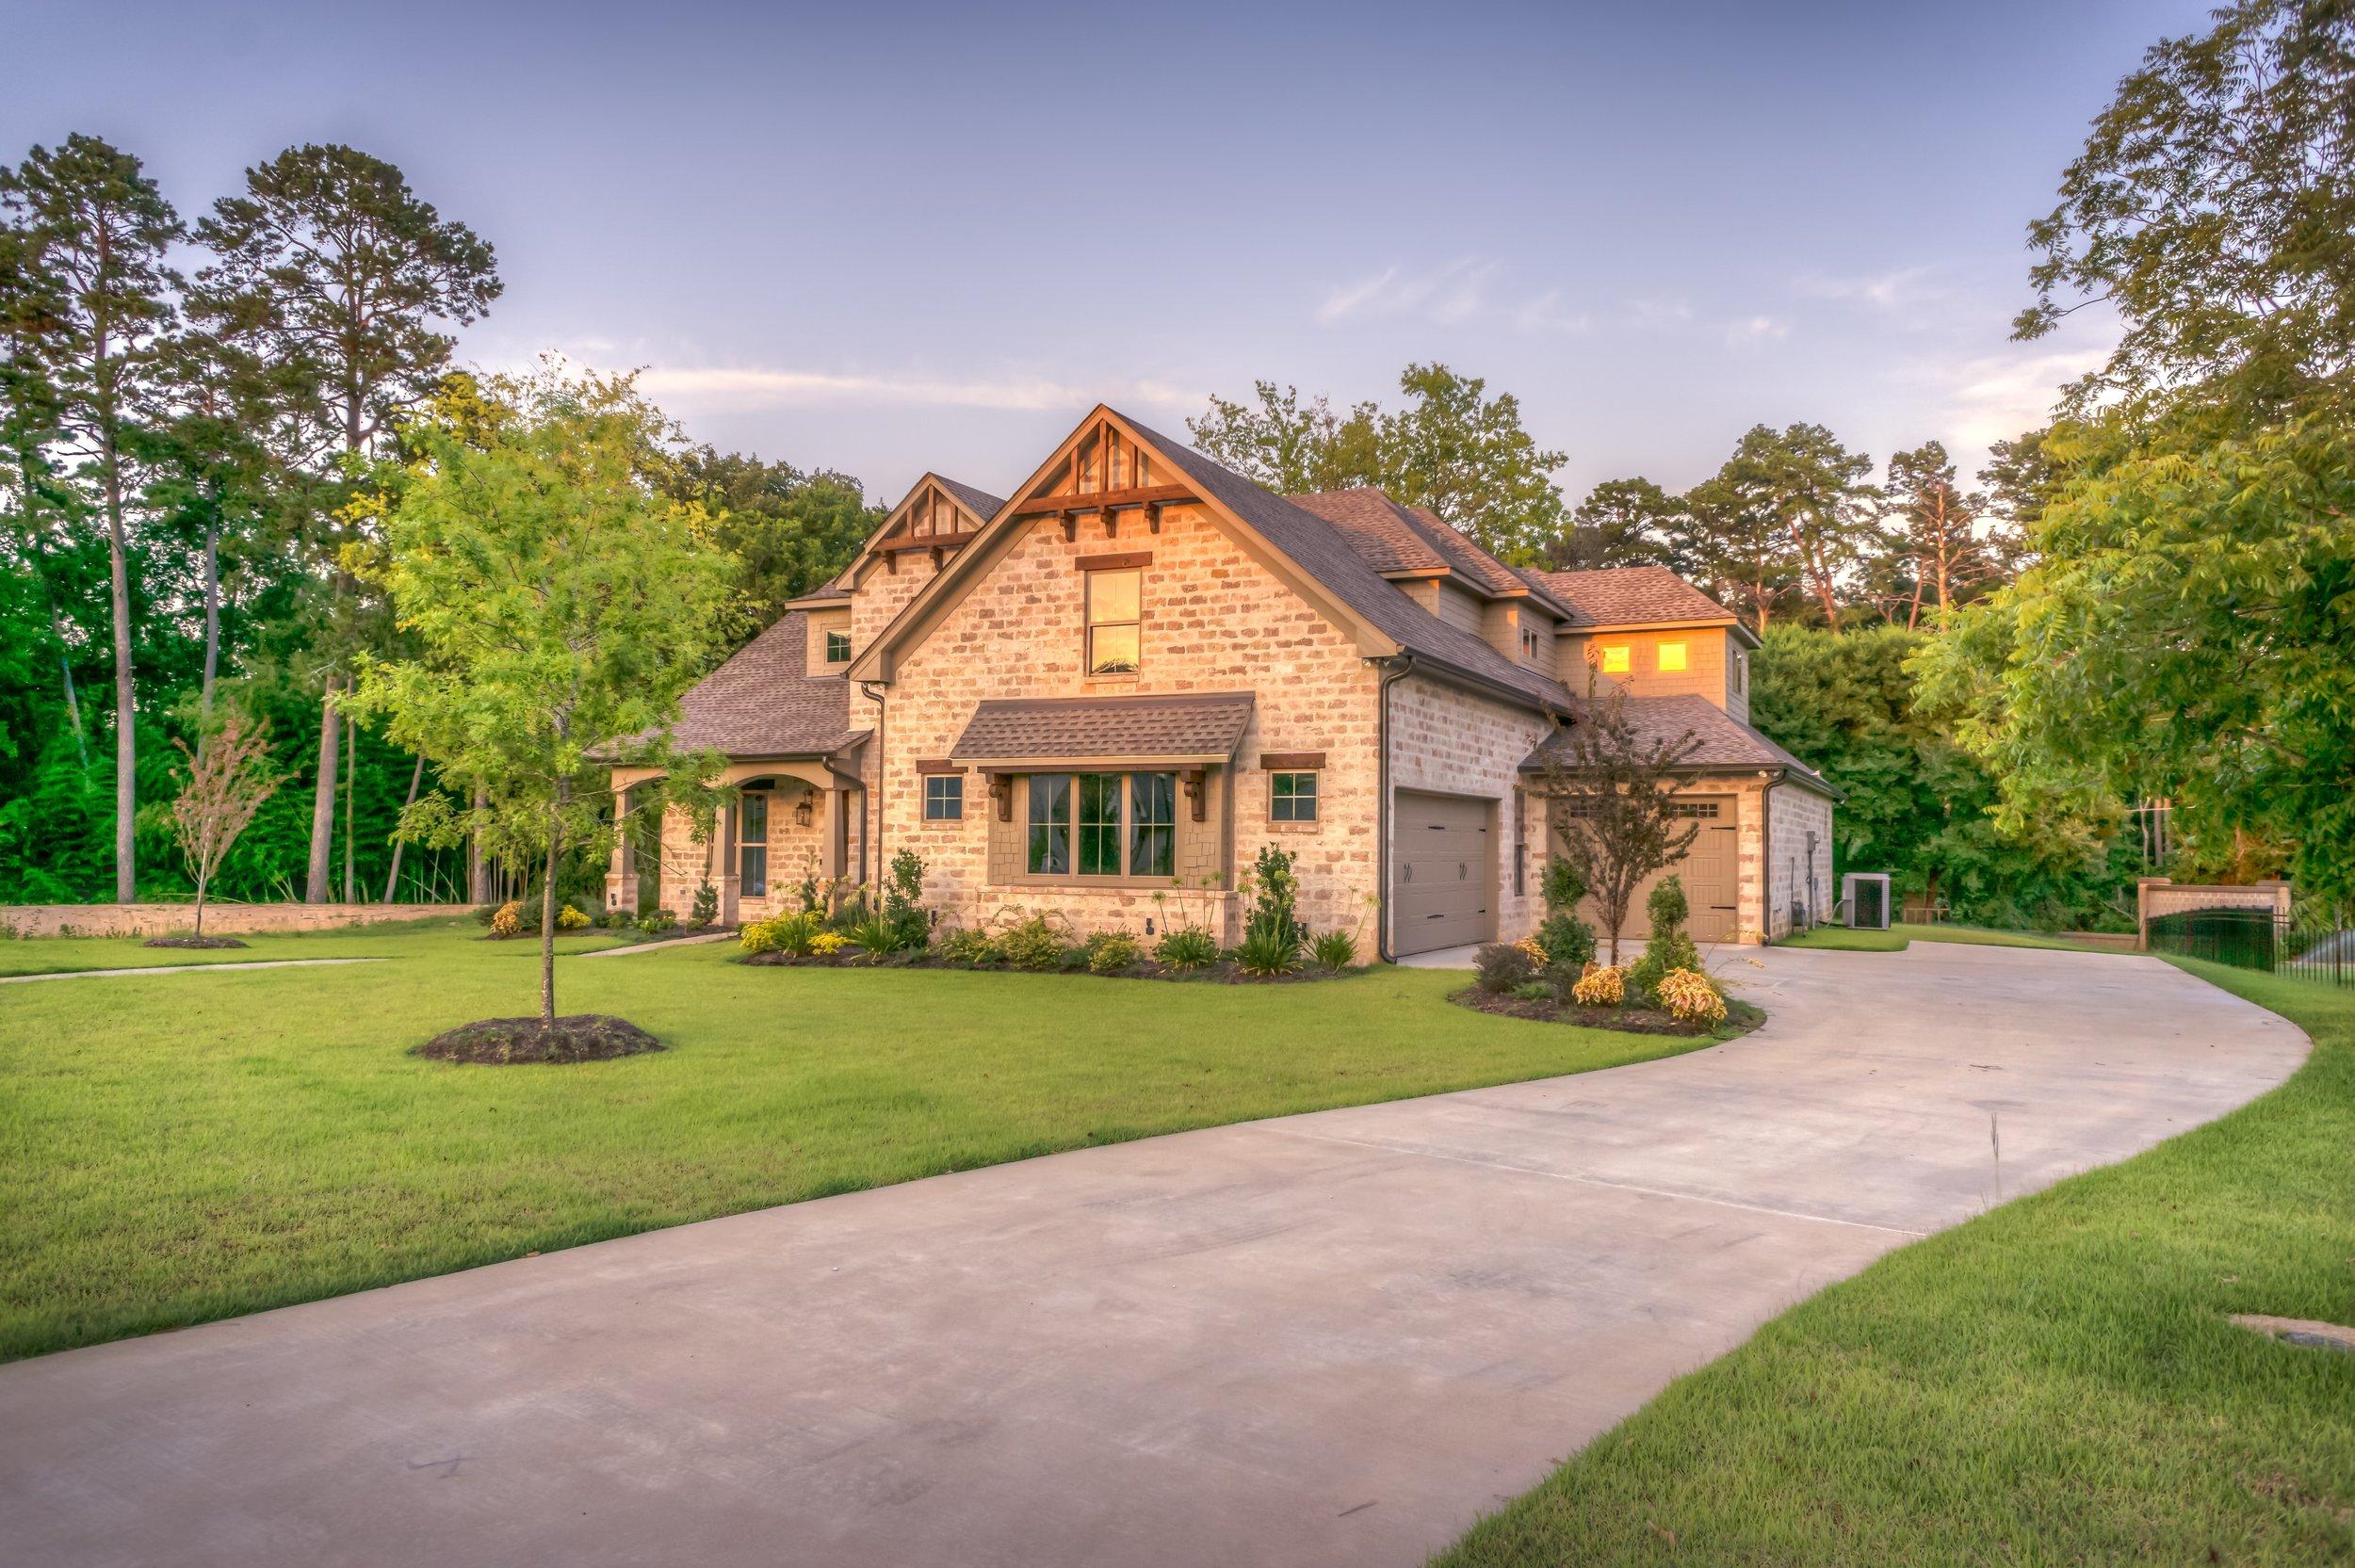 Home_Purchasing.jpg